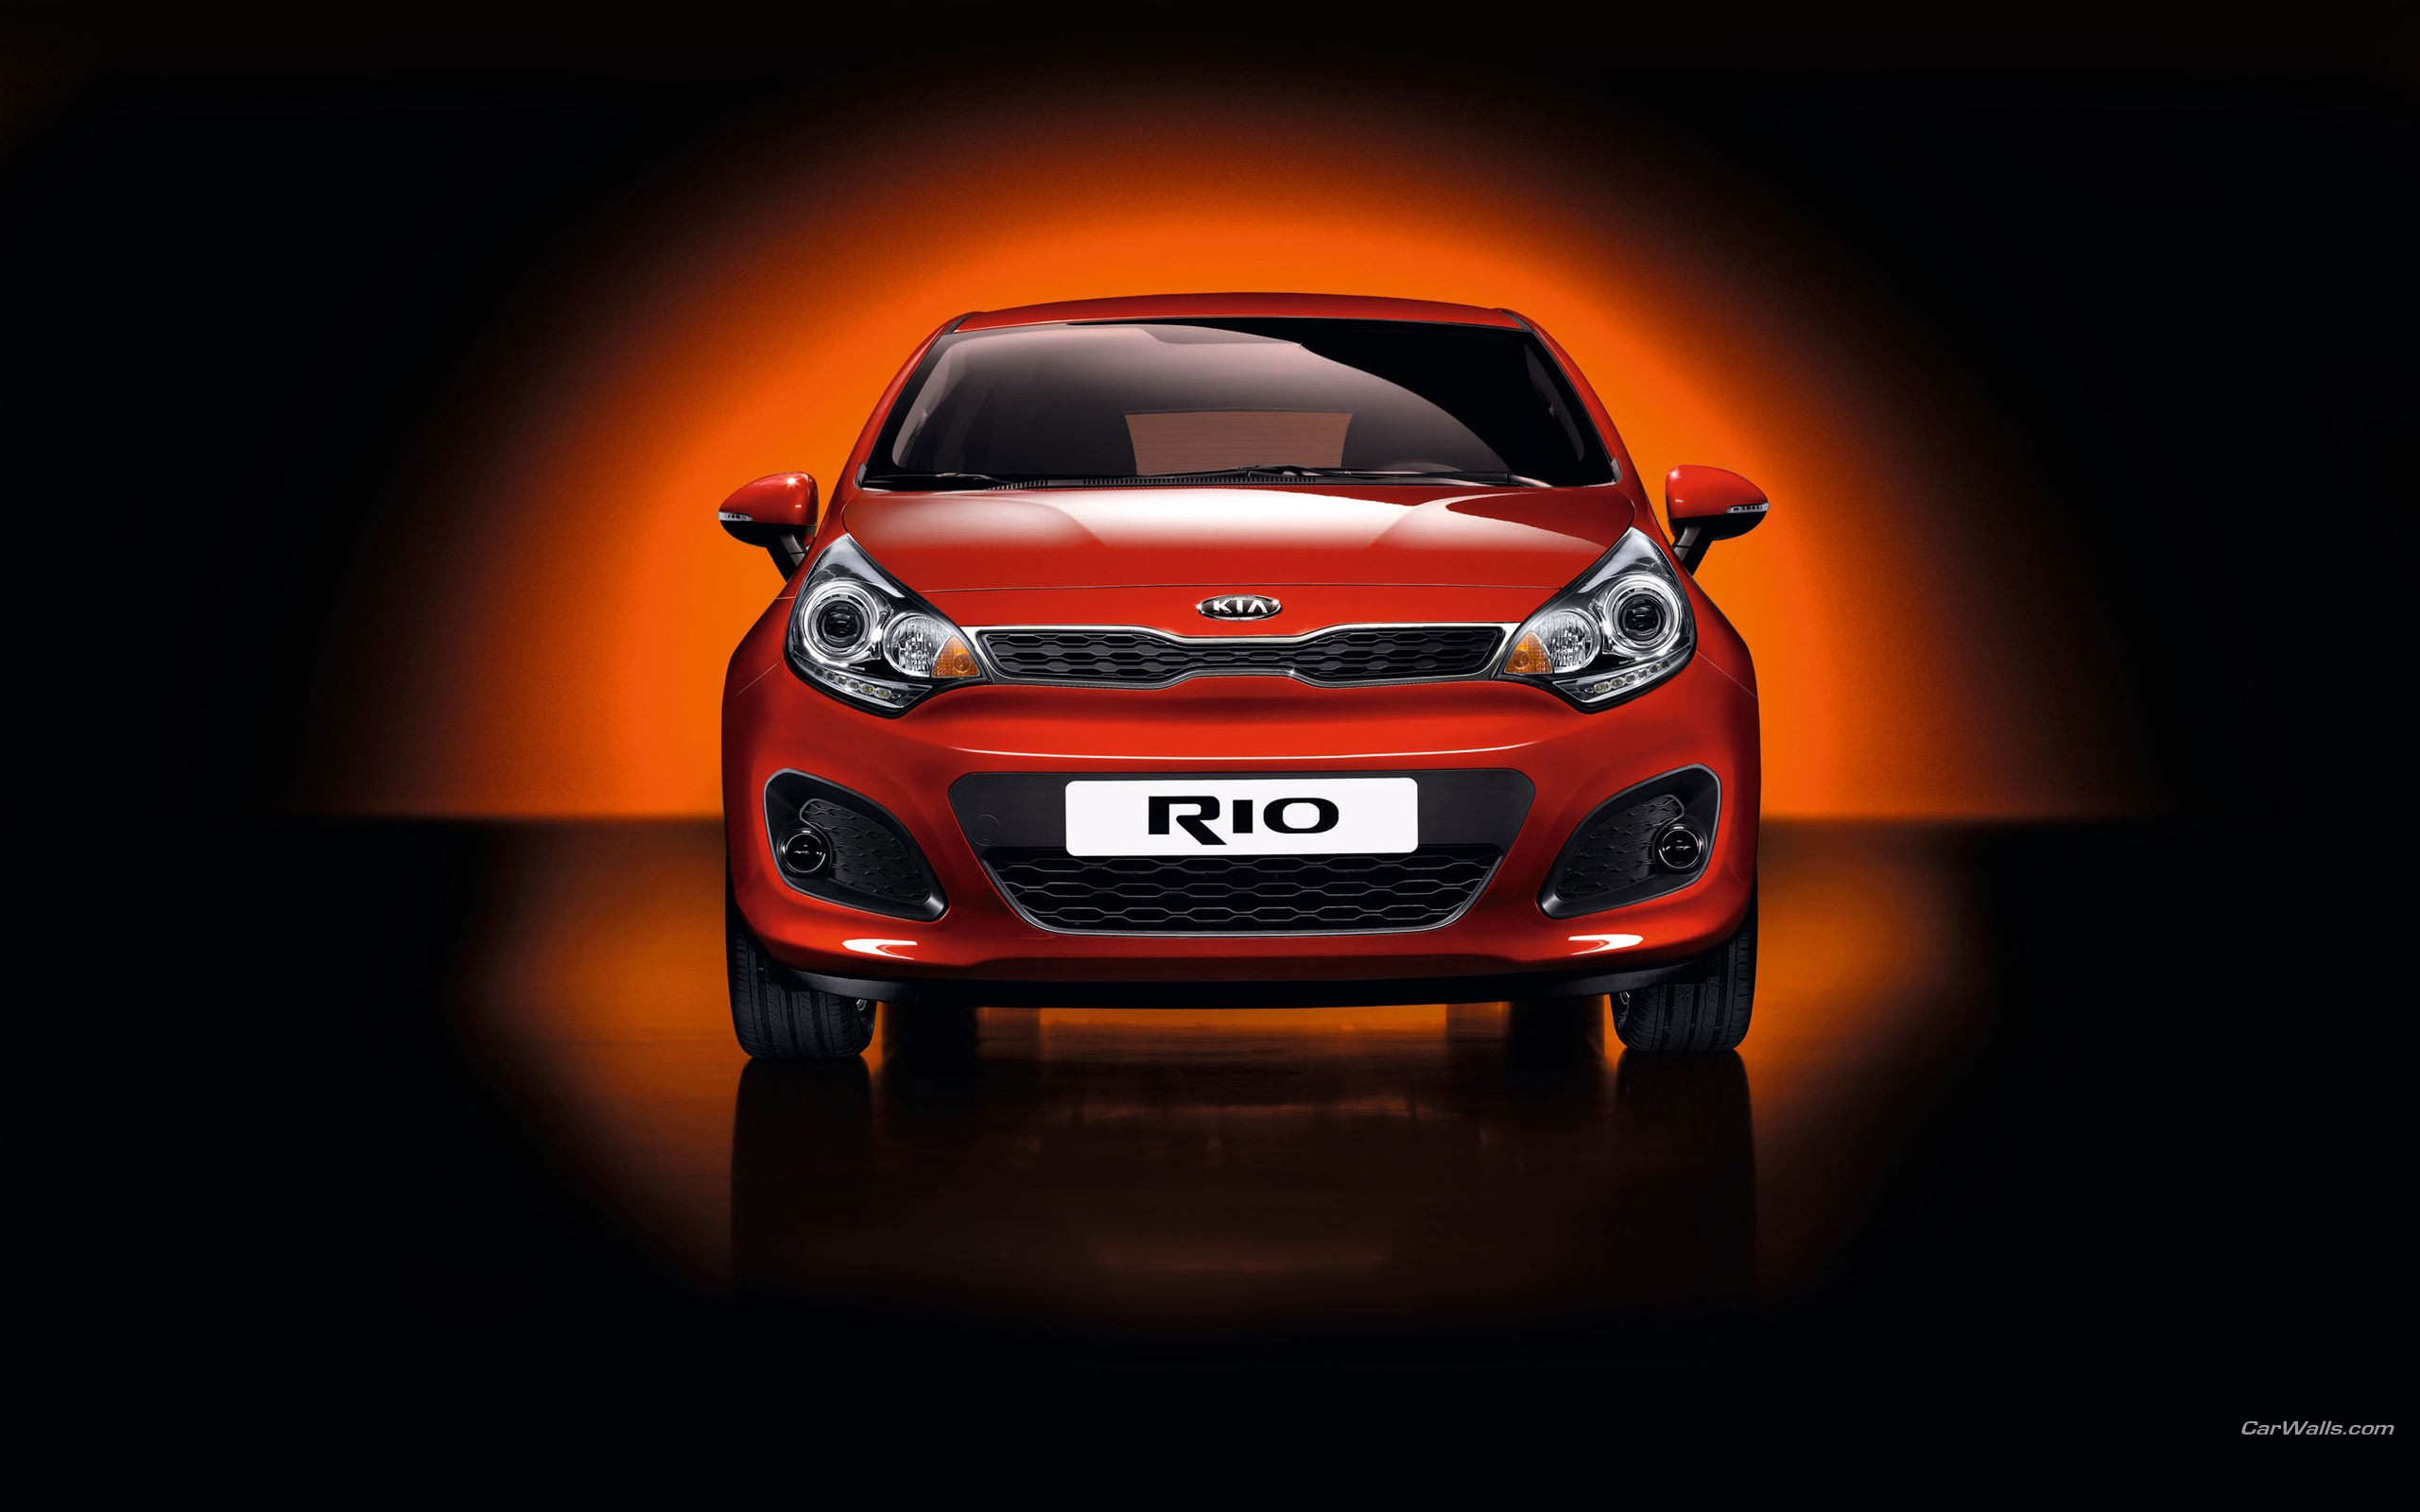 sat sls sportage tt kia wessex ql diesel newport garages alloywheel autos crdi in auto x manual infrared red used nav infra